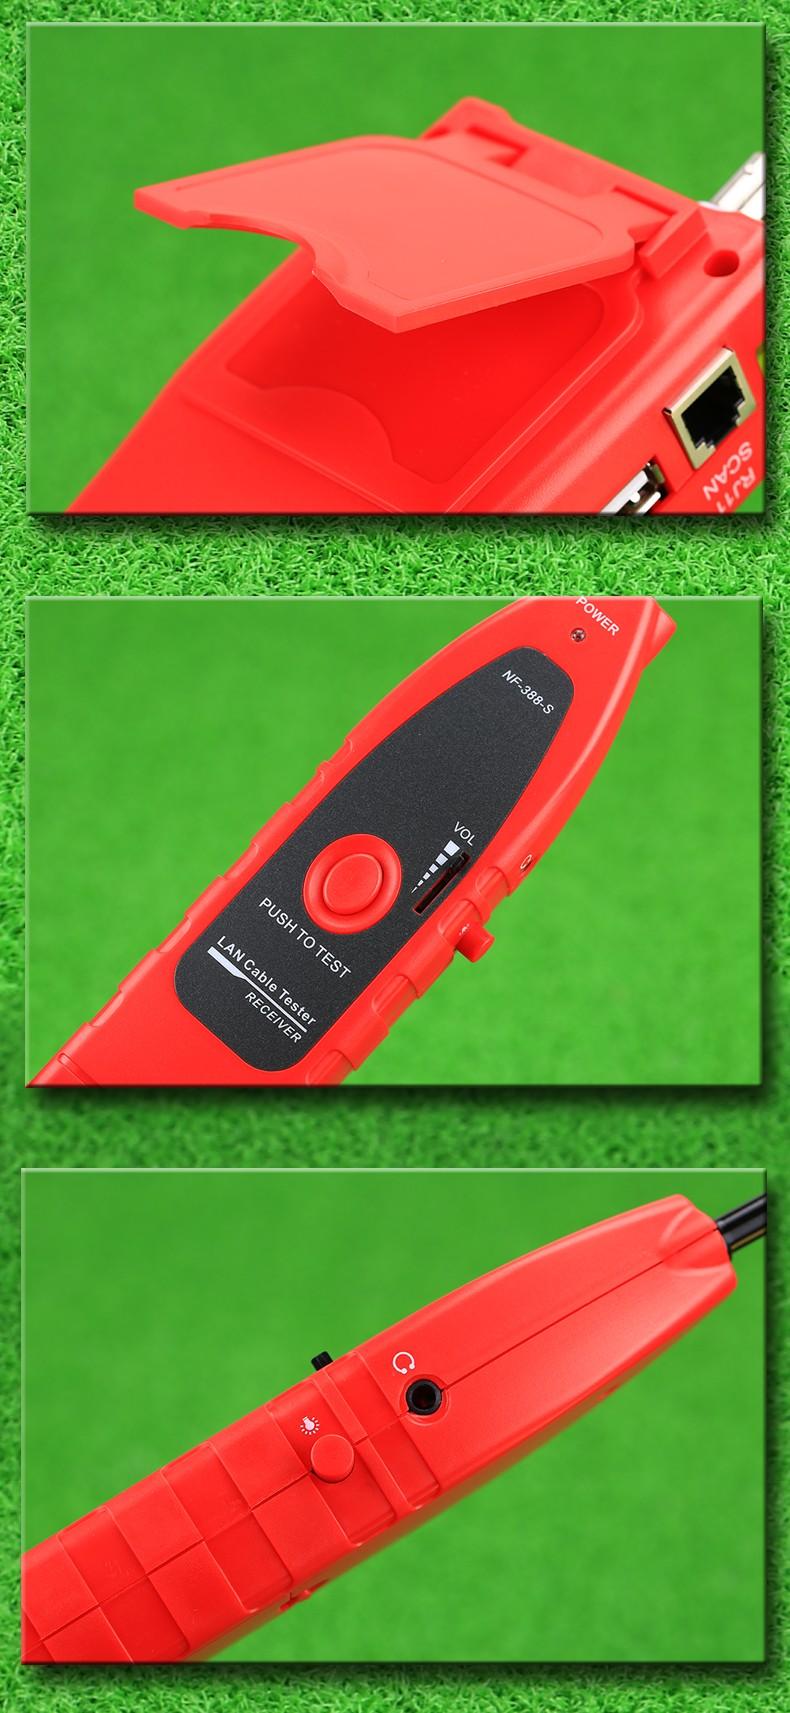 KELUSHI Multi-funcional Handheld Testador de Cabo testador